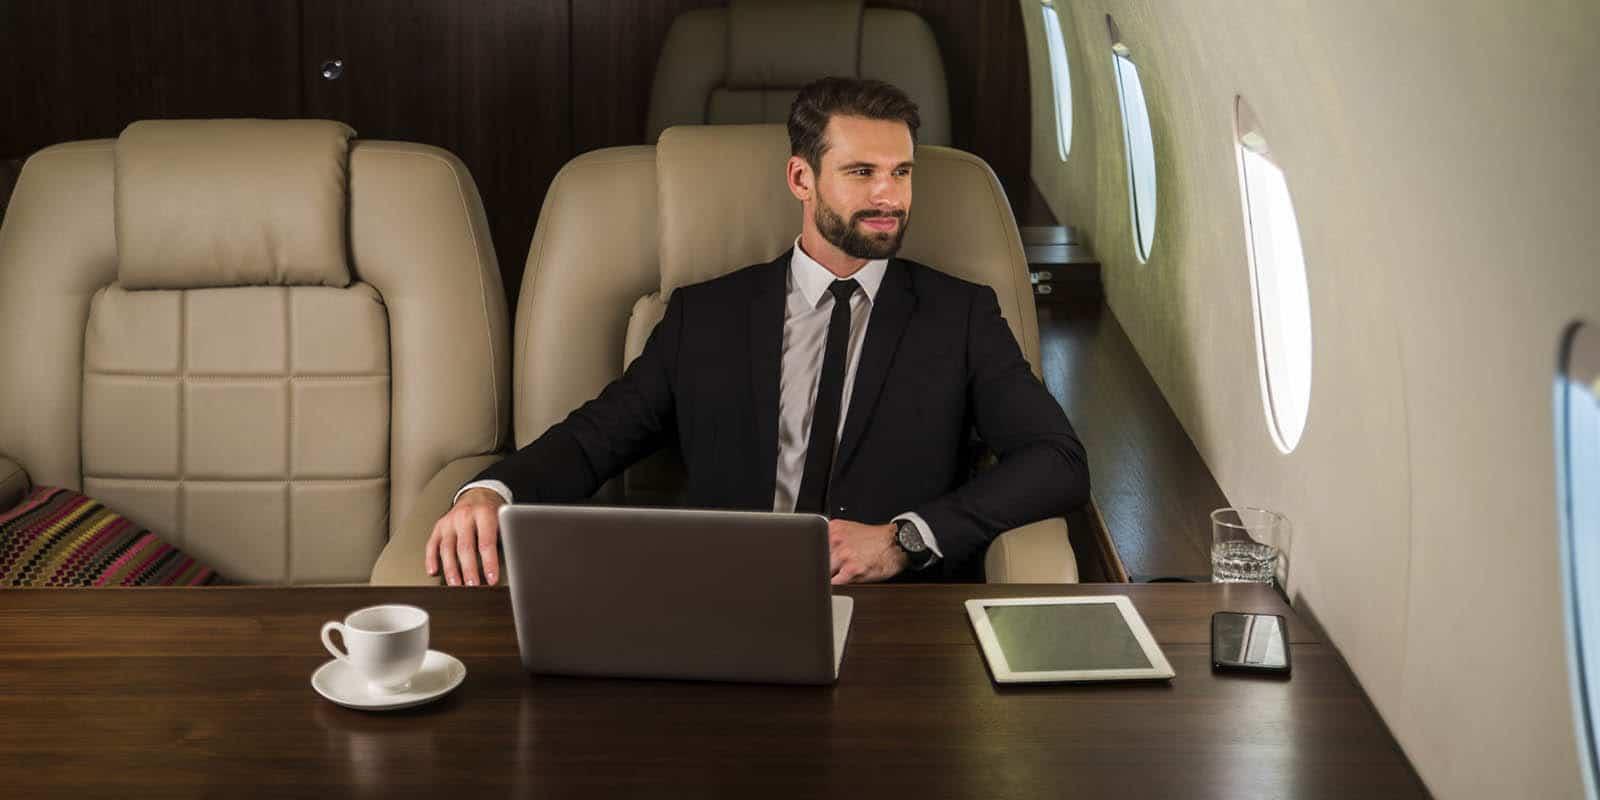 Economic citizen travelling in his private jet